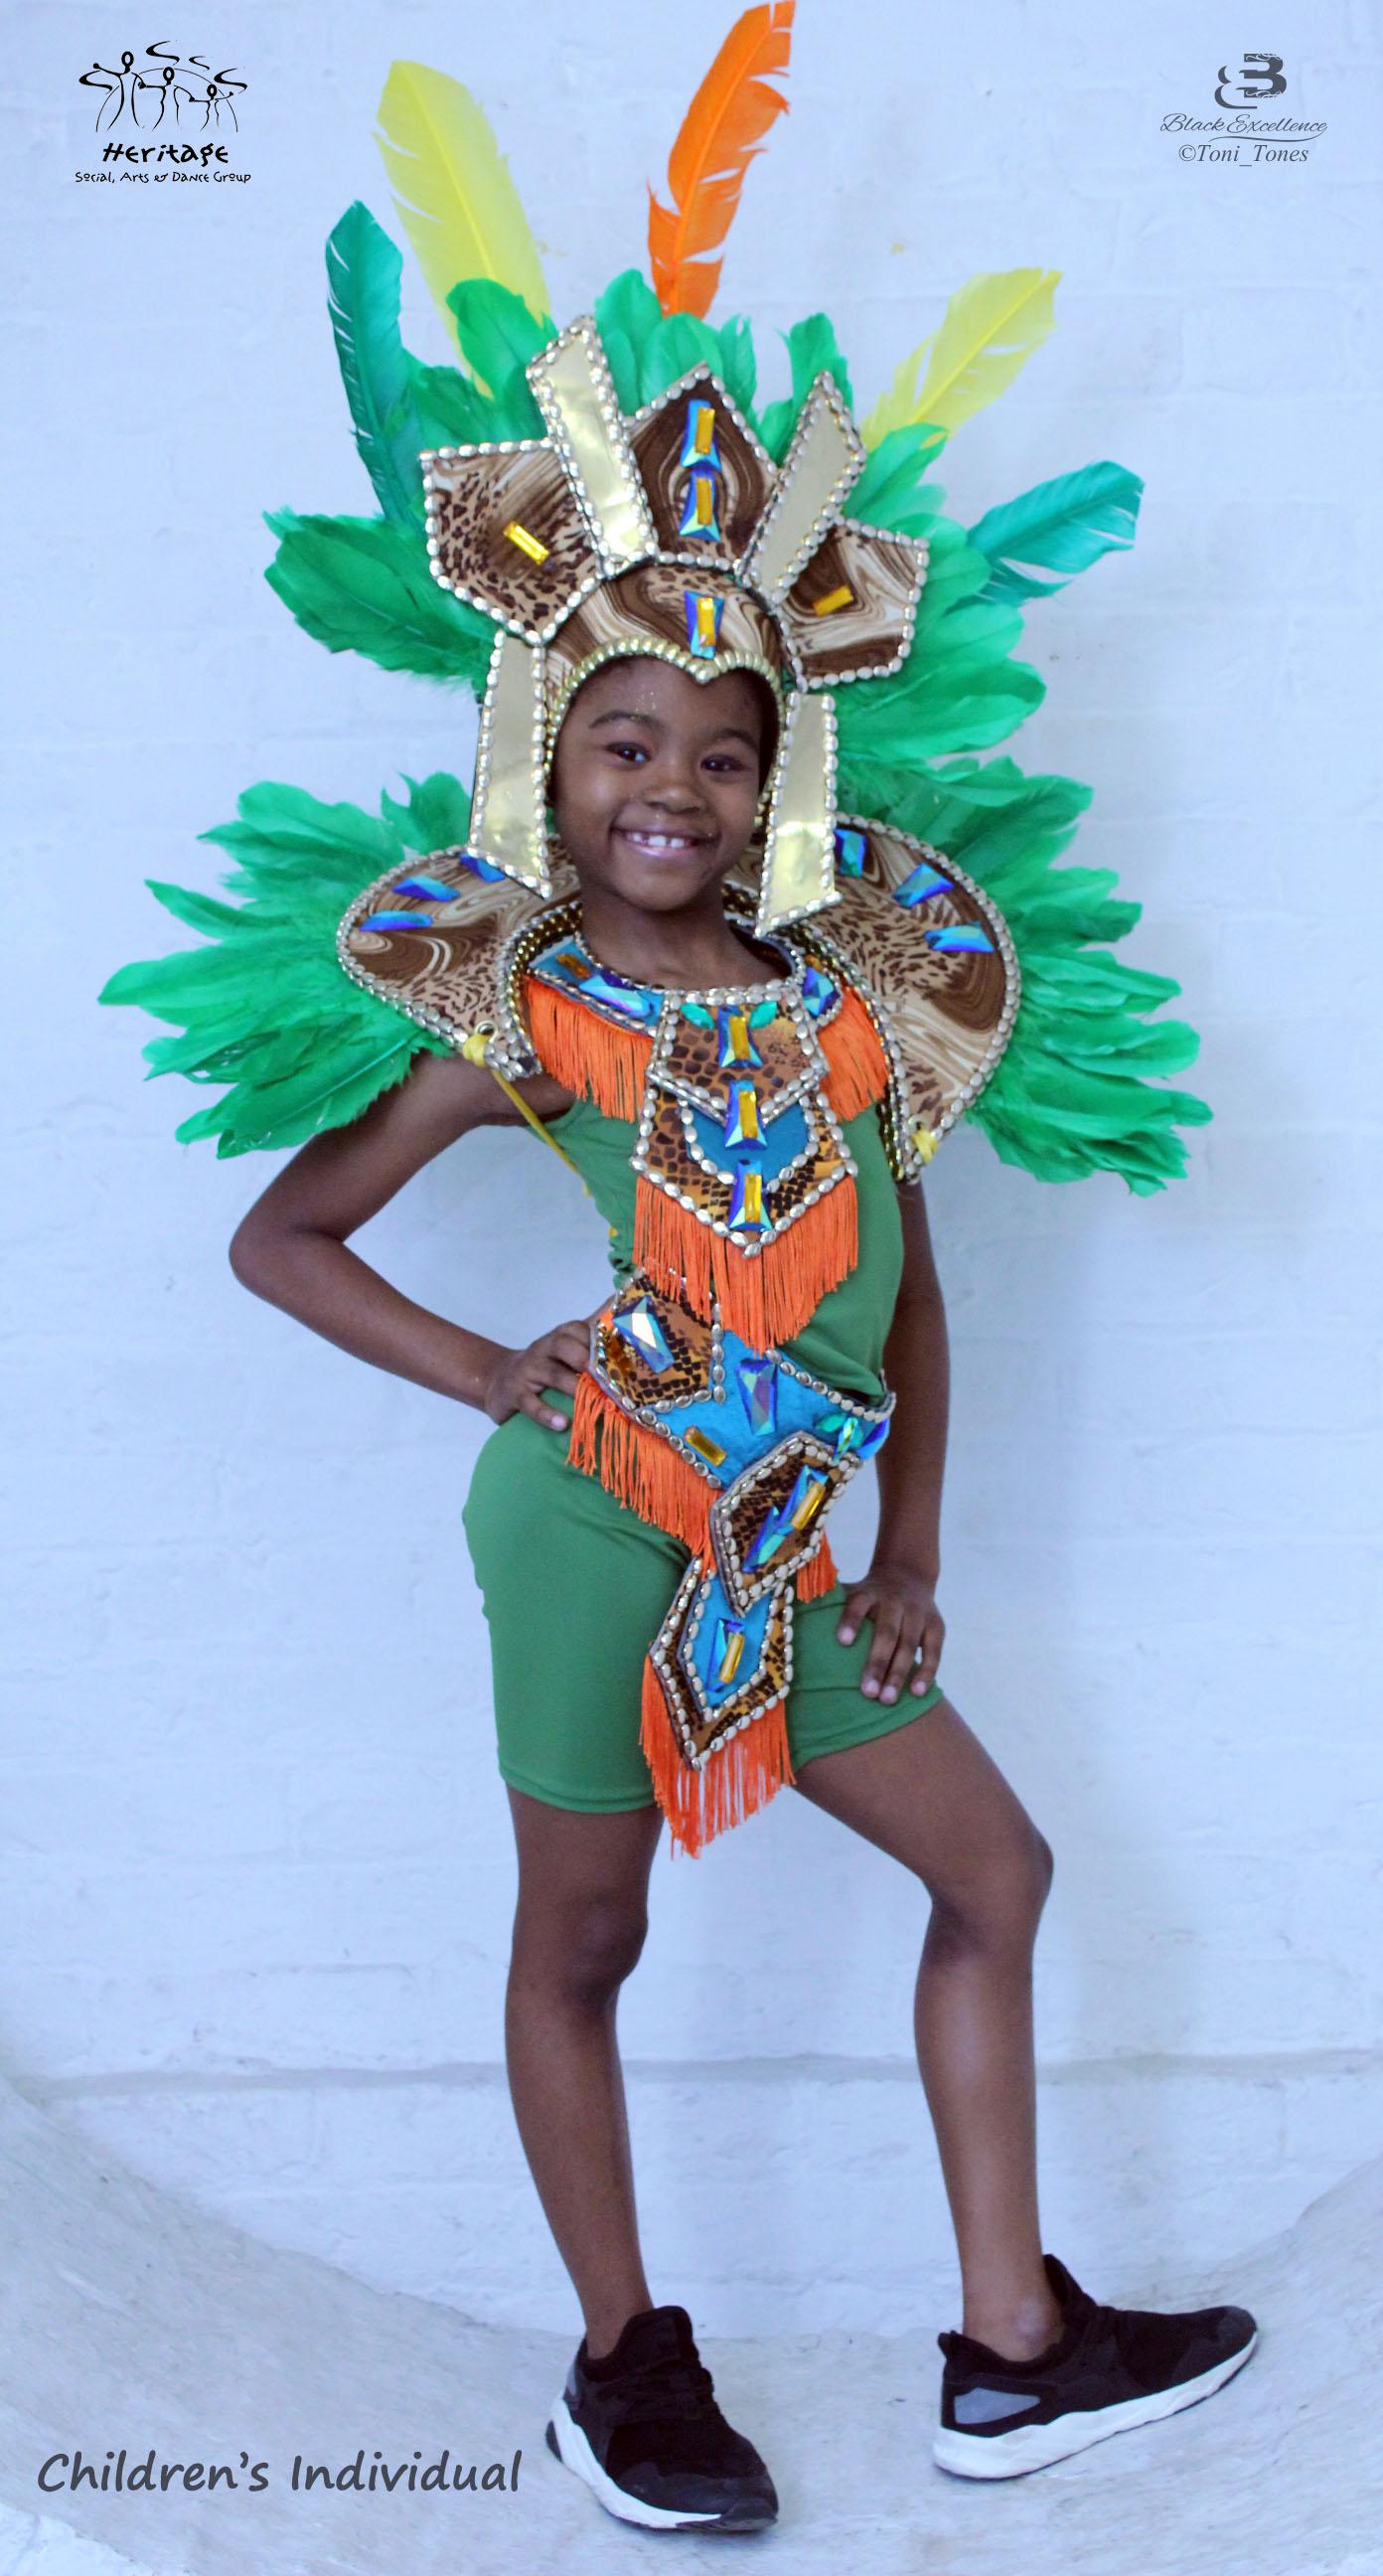 Childrenu0027s Inidual Carnival Costume  sc 1 st  Heritage Social Arts u0026 Dance Group & Childrenu0027s Inidual Carnival Costumes - Heritage Dance Group